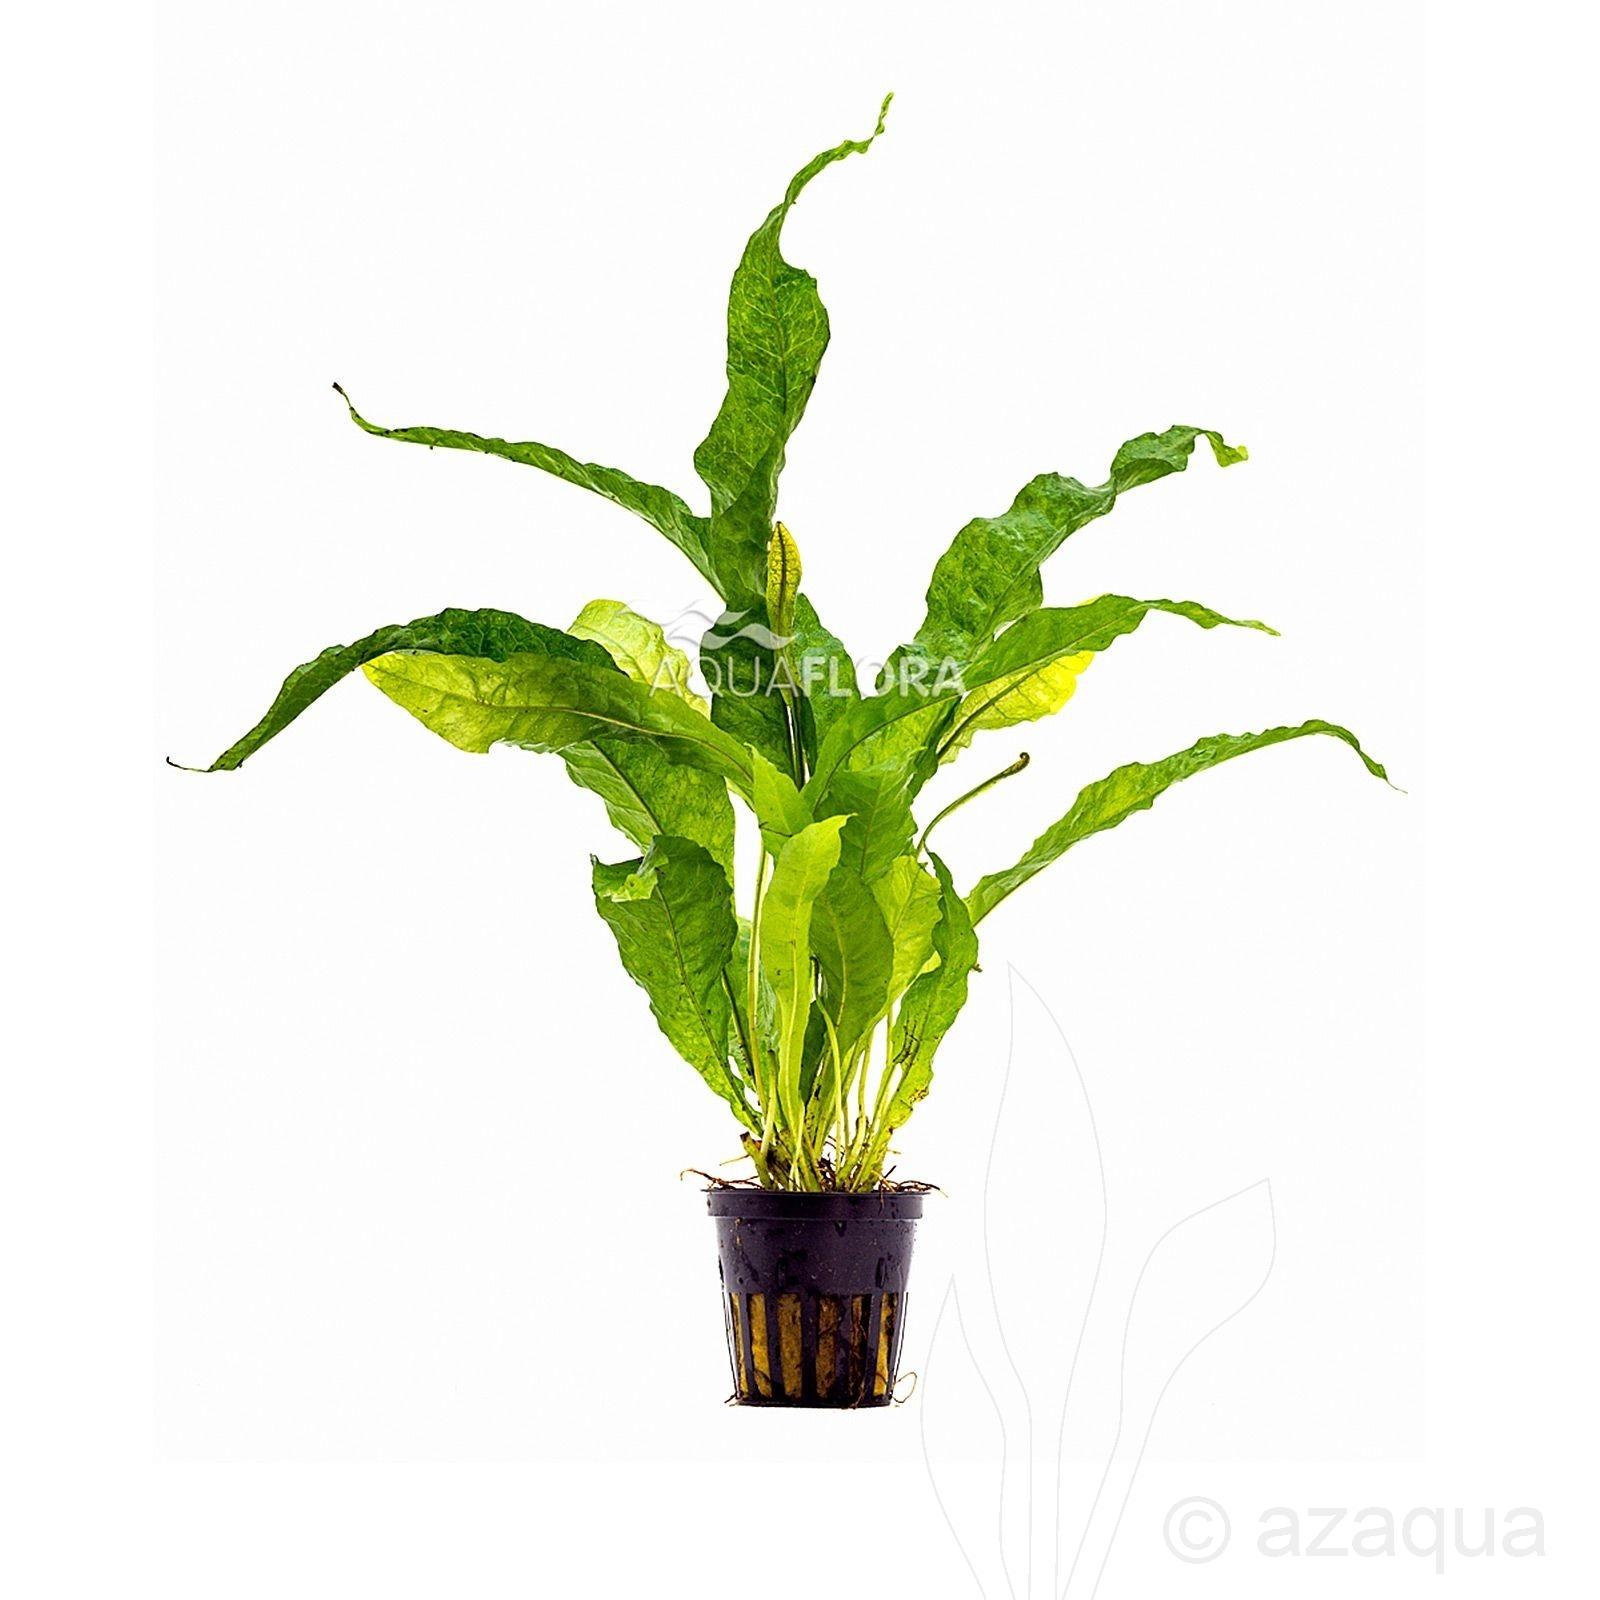 Microsorum pteropus 'Latifolia'